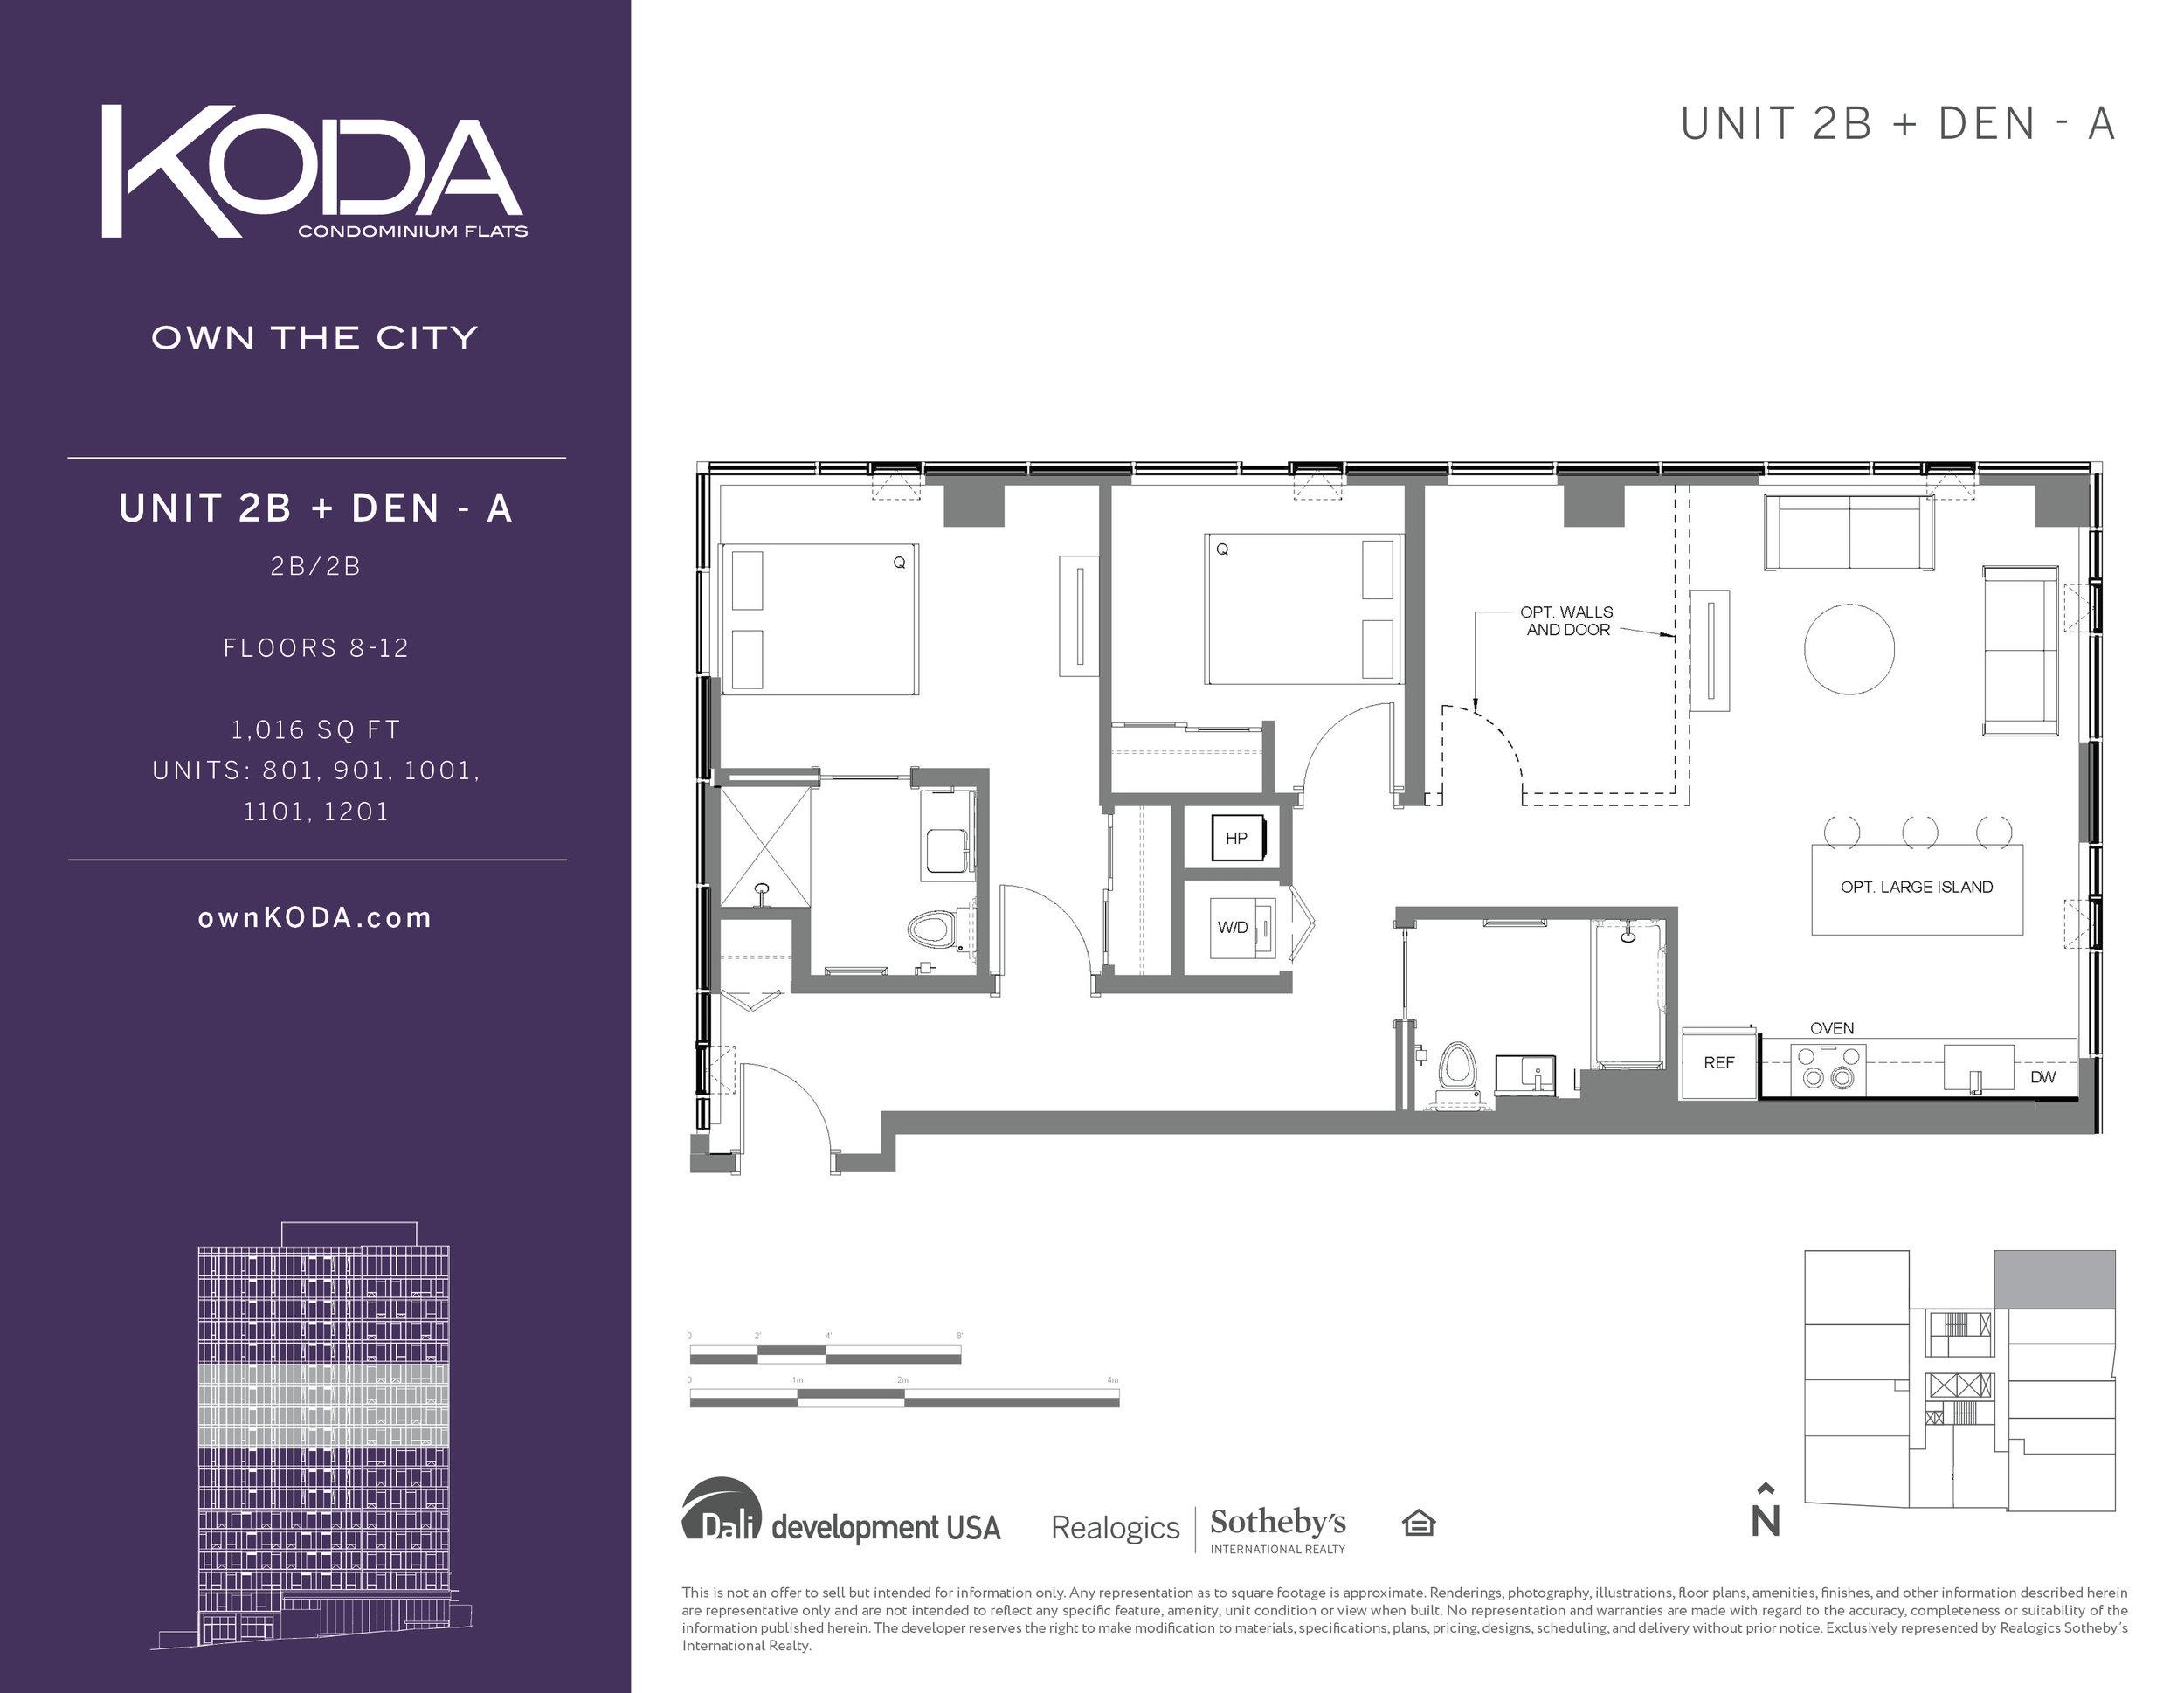 KODA_FloorPlanFlyer_Update_Approved_04.04.19_Release35.jpg